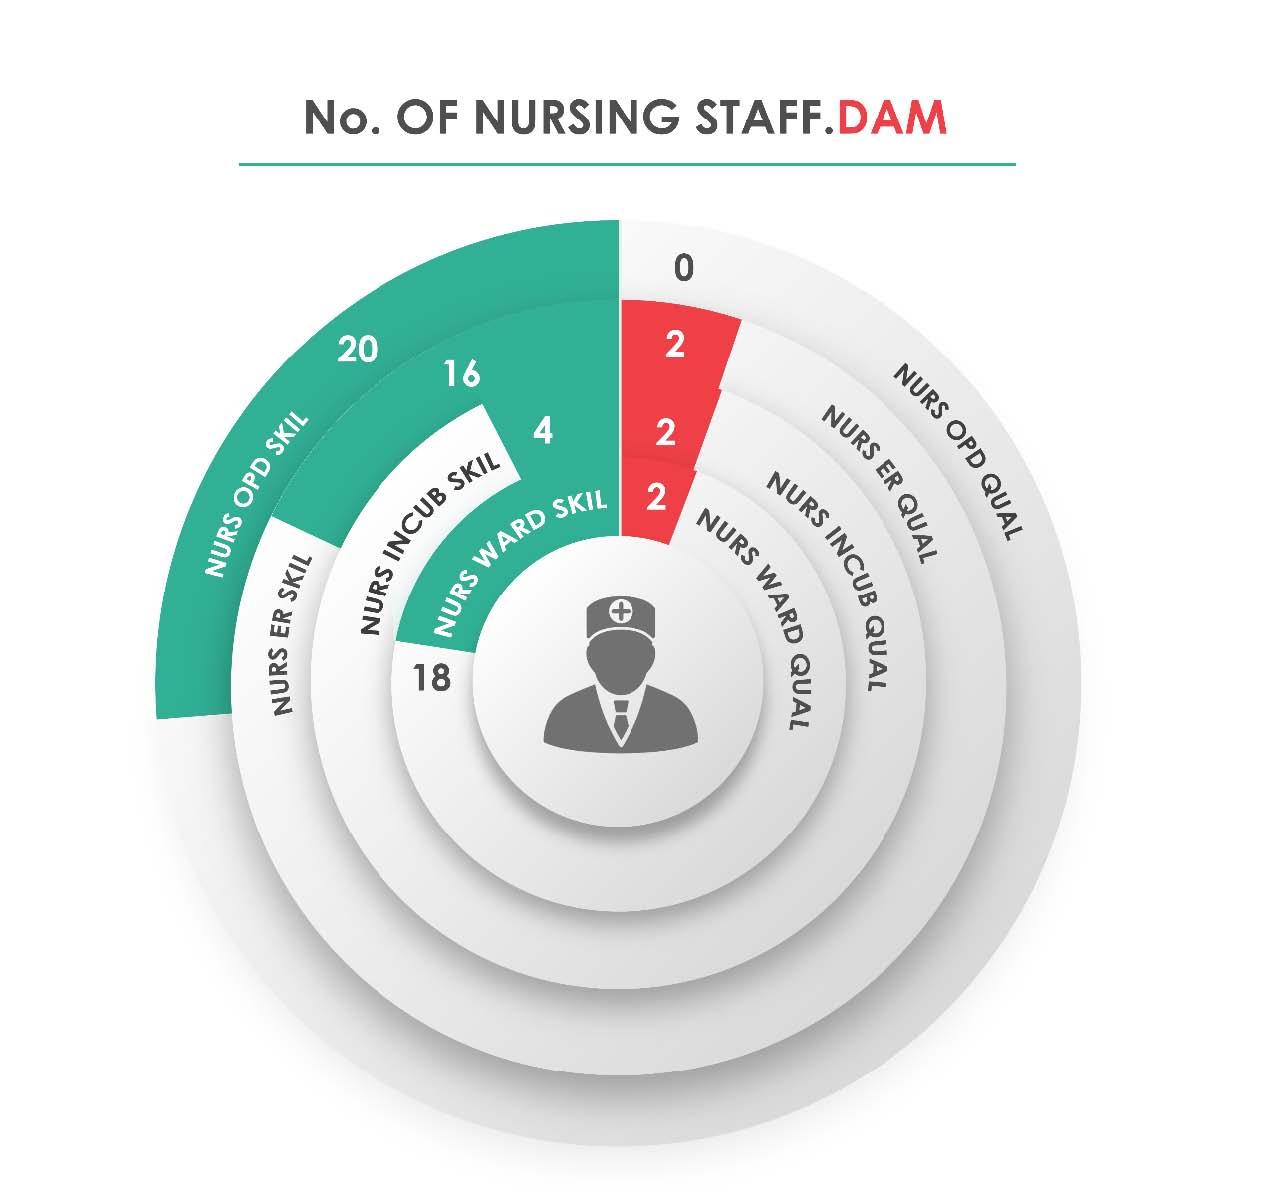 Fig._50.1_Human_Resources_Nursing_Staff__Damascus.jpg